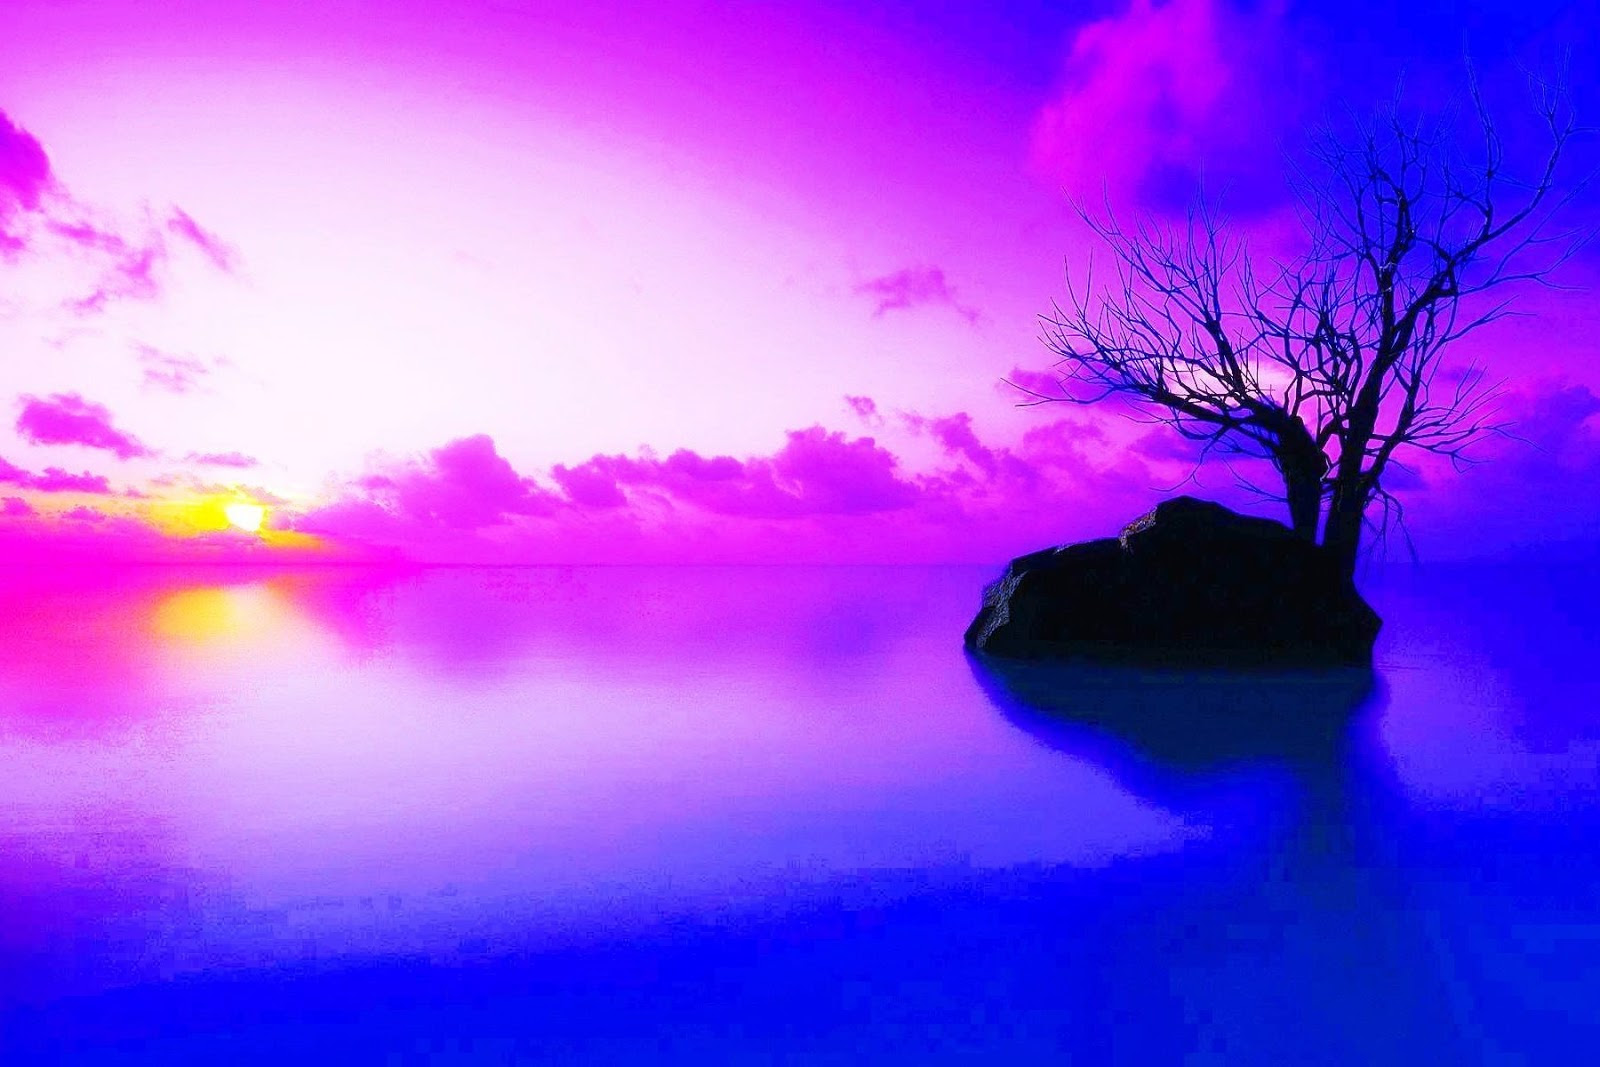 Download 900 Wallpaper Hd Background HD Terbaru